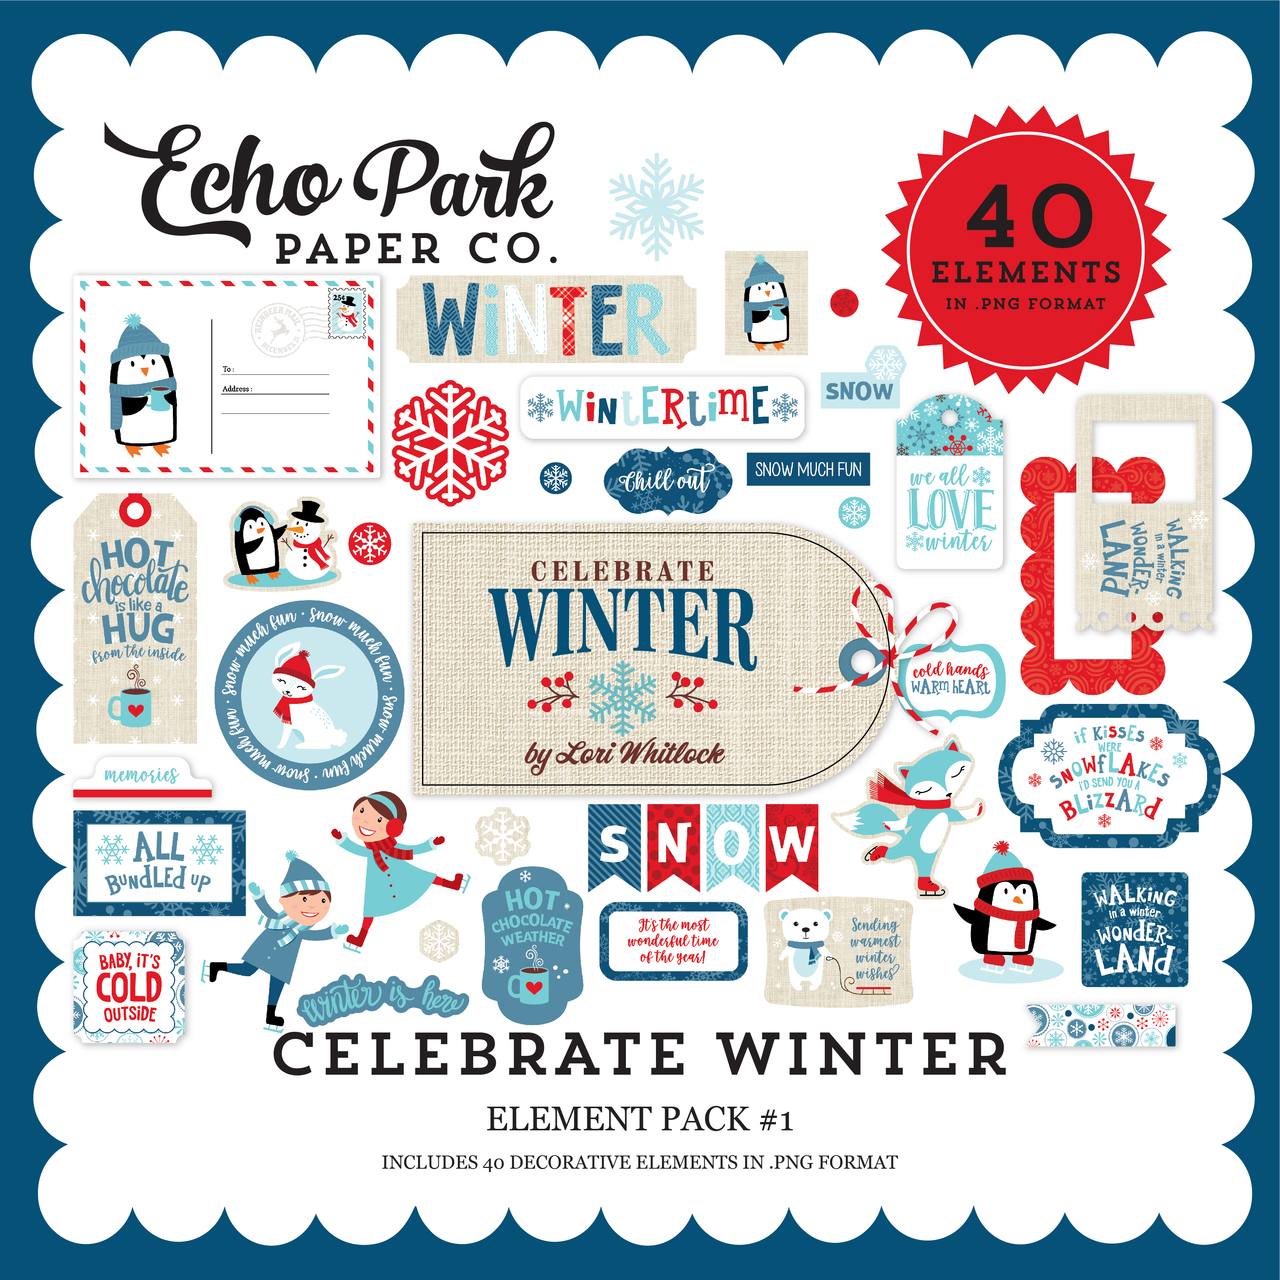 Celebrate Winter Element Pack #1